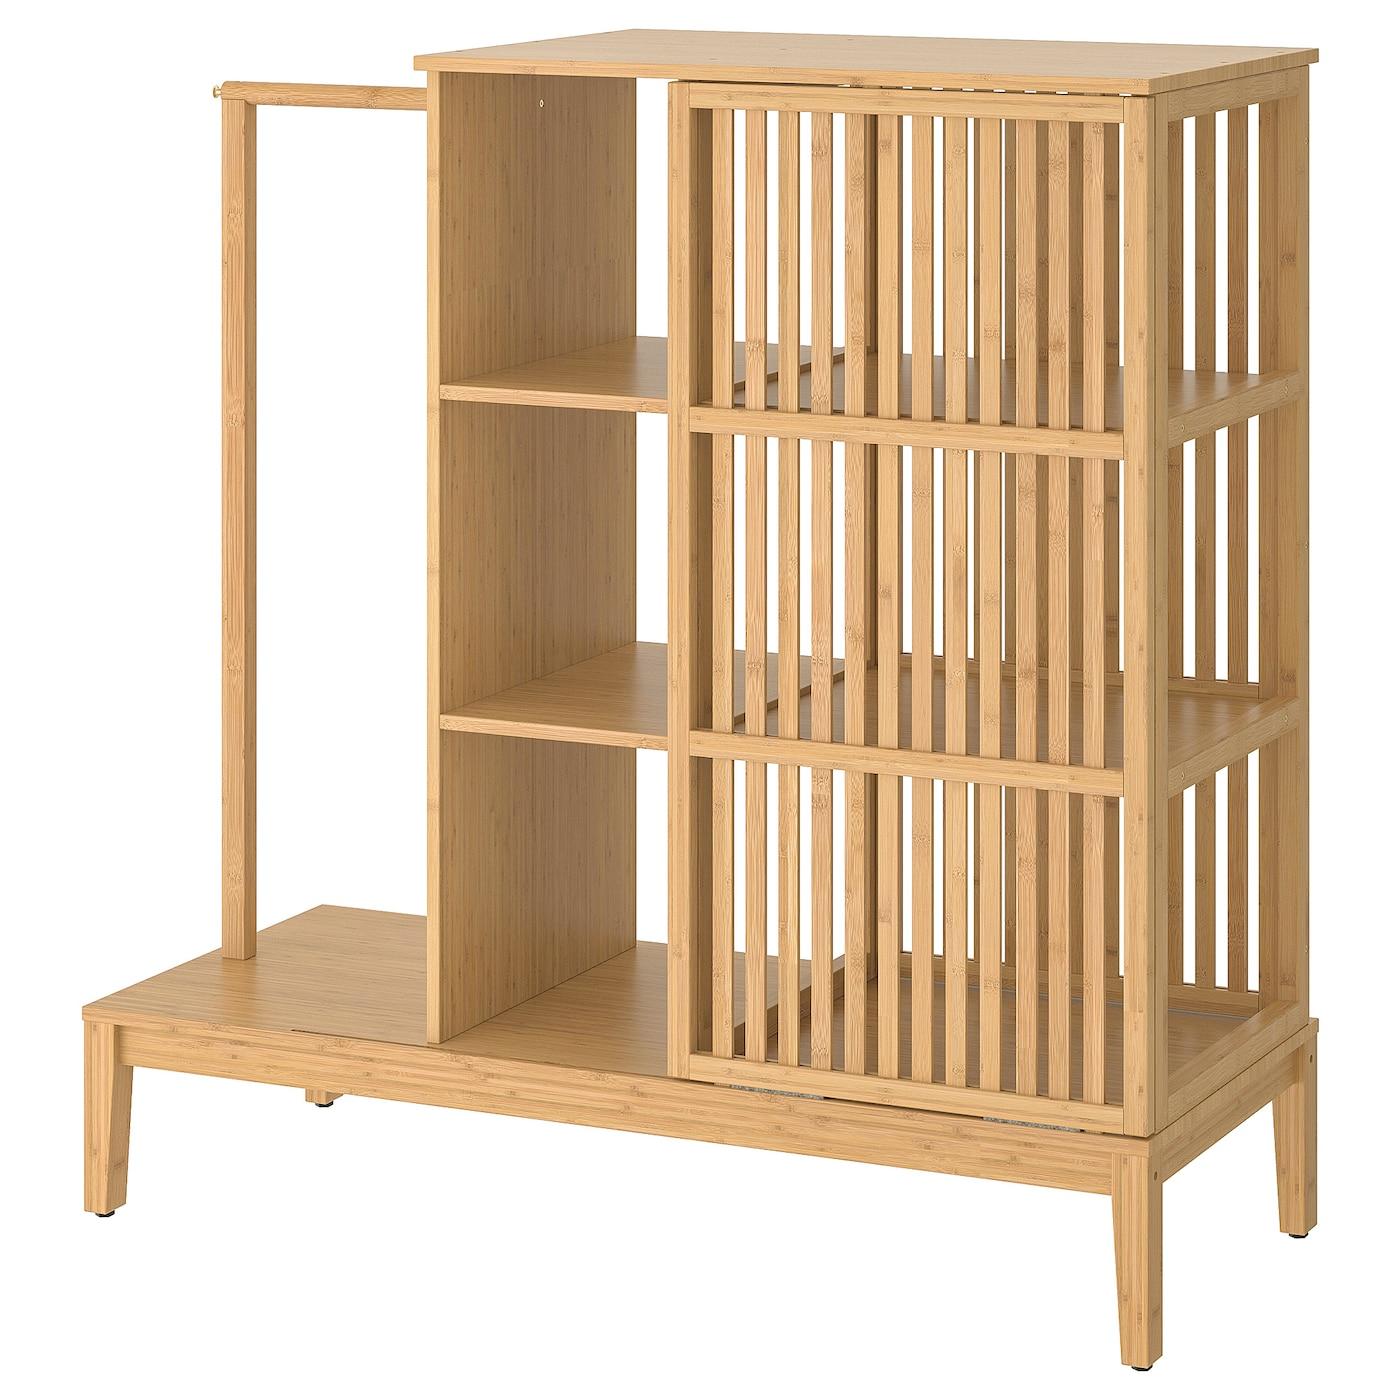 isa-open-wardrobe-with-sliding-door-bamboo__0756080_PE748763_S5